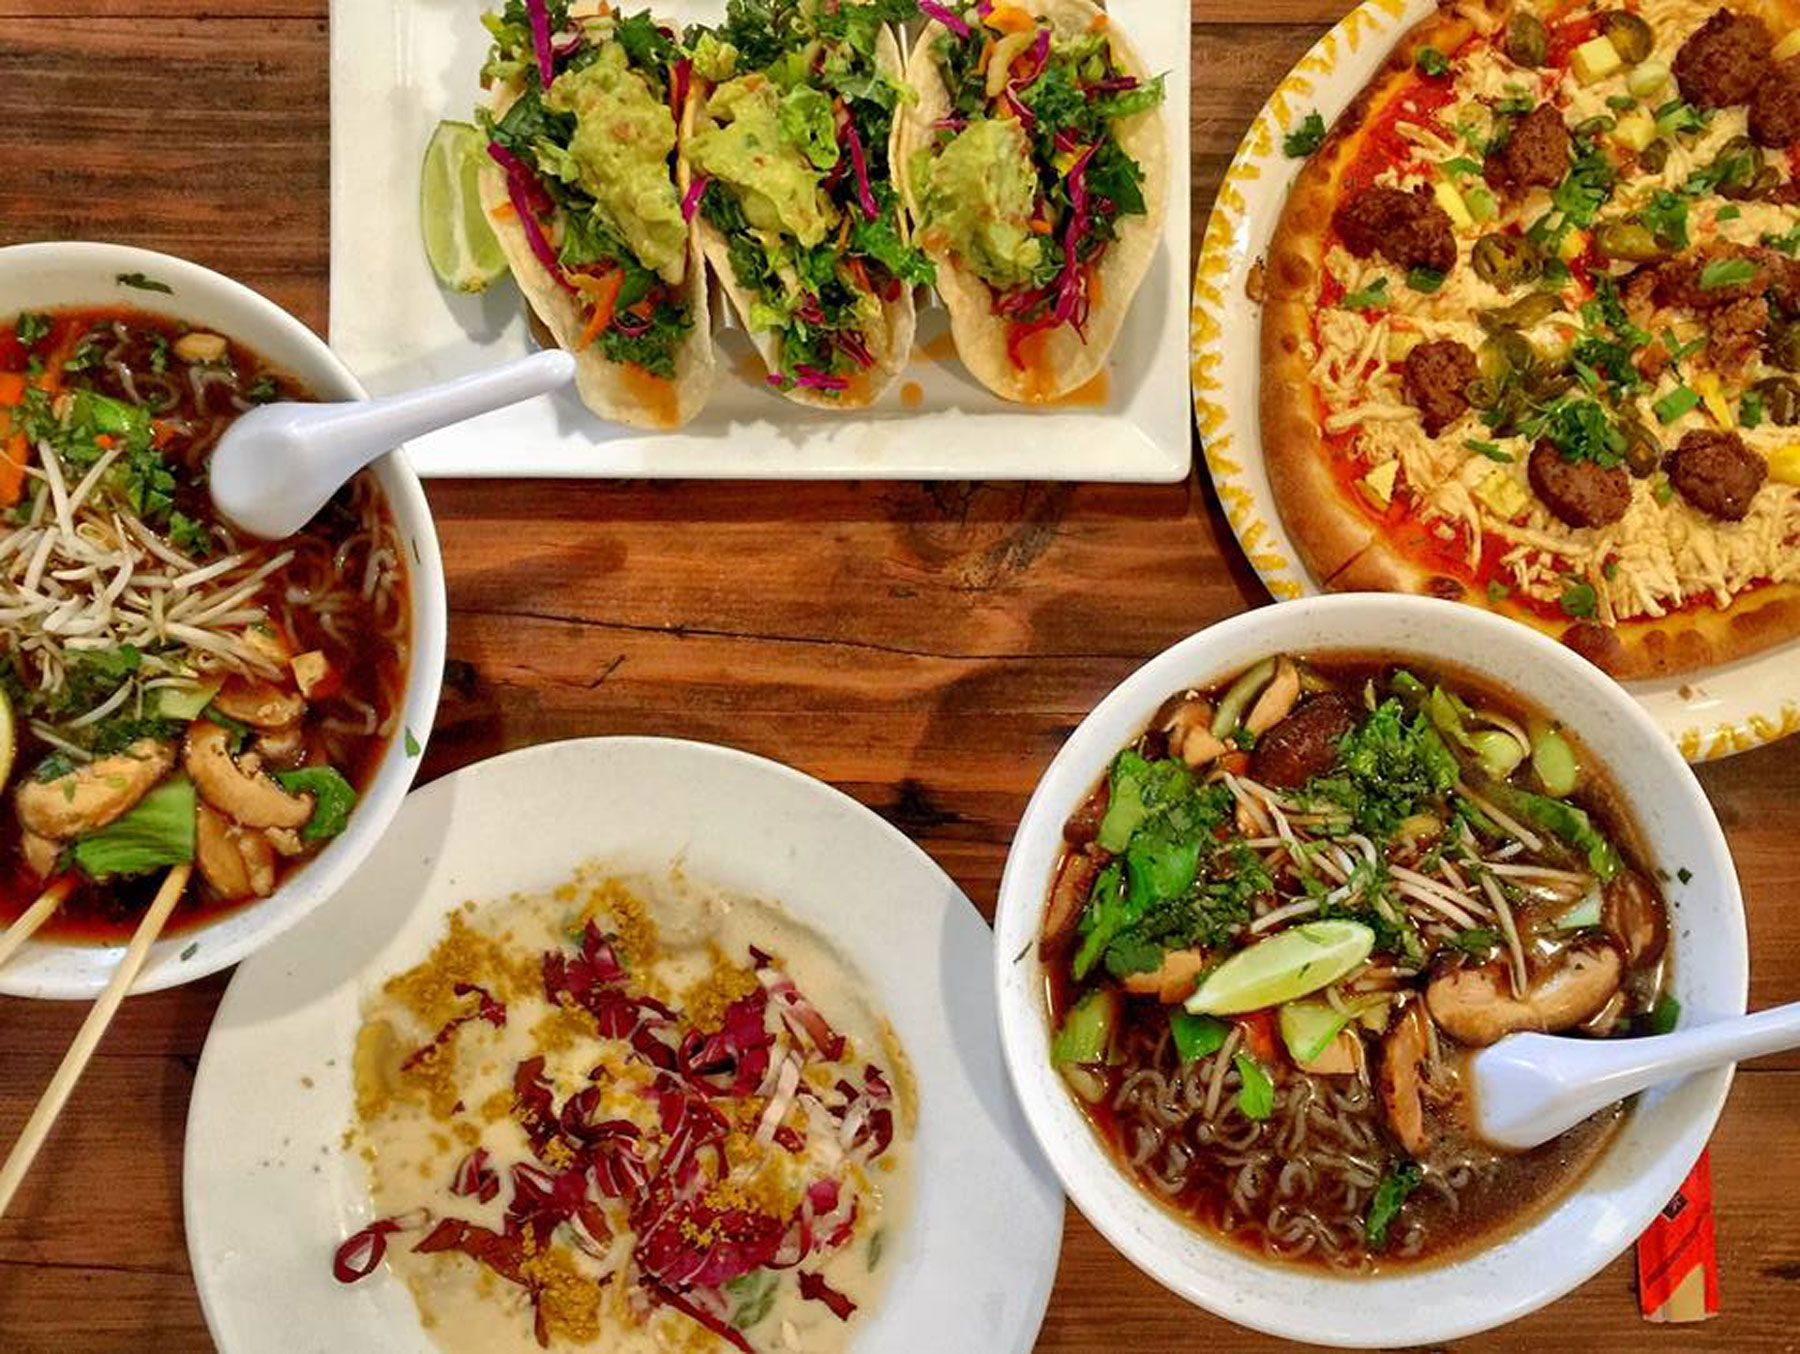 14 Vegetarian And Vegan Restaurants In Florida You Need To Visit Asap